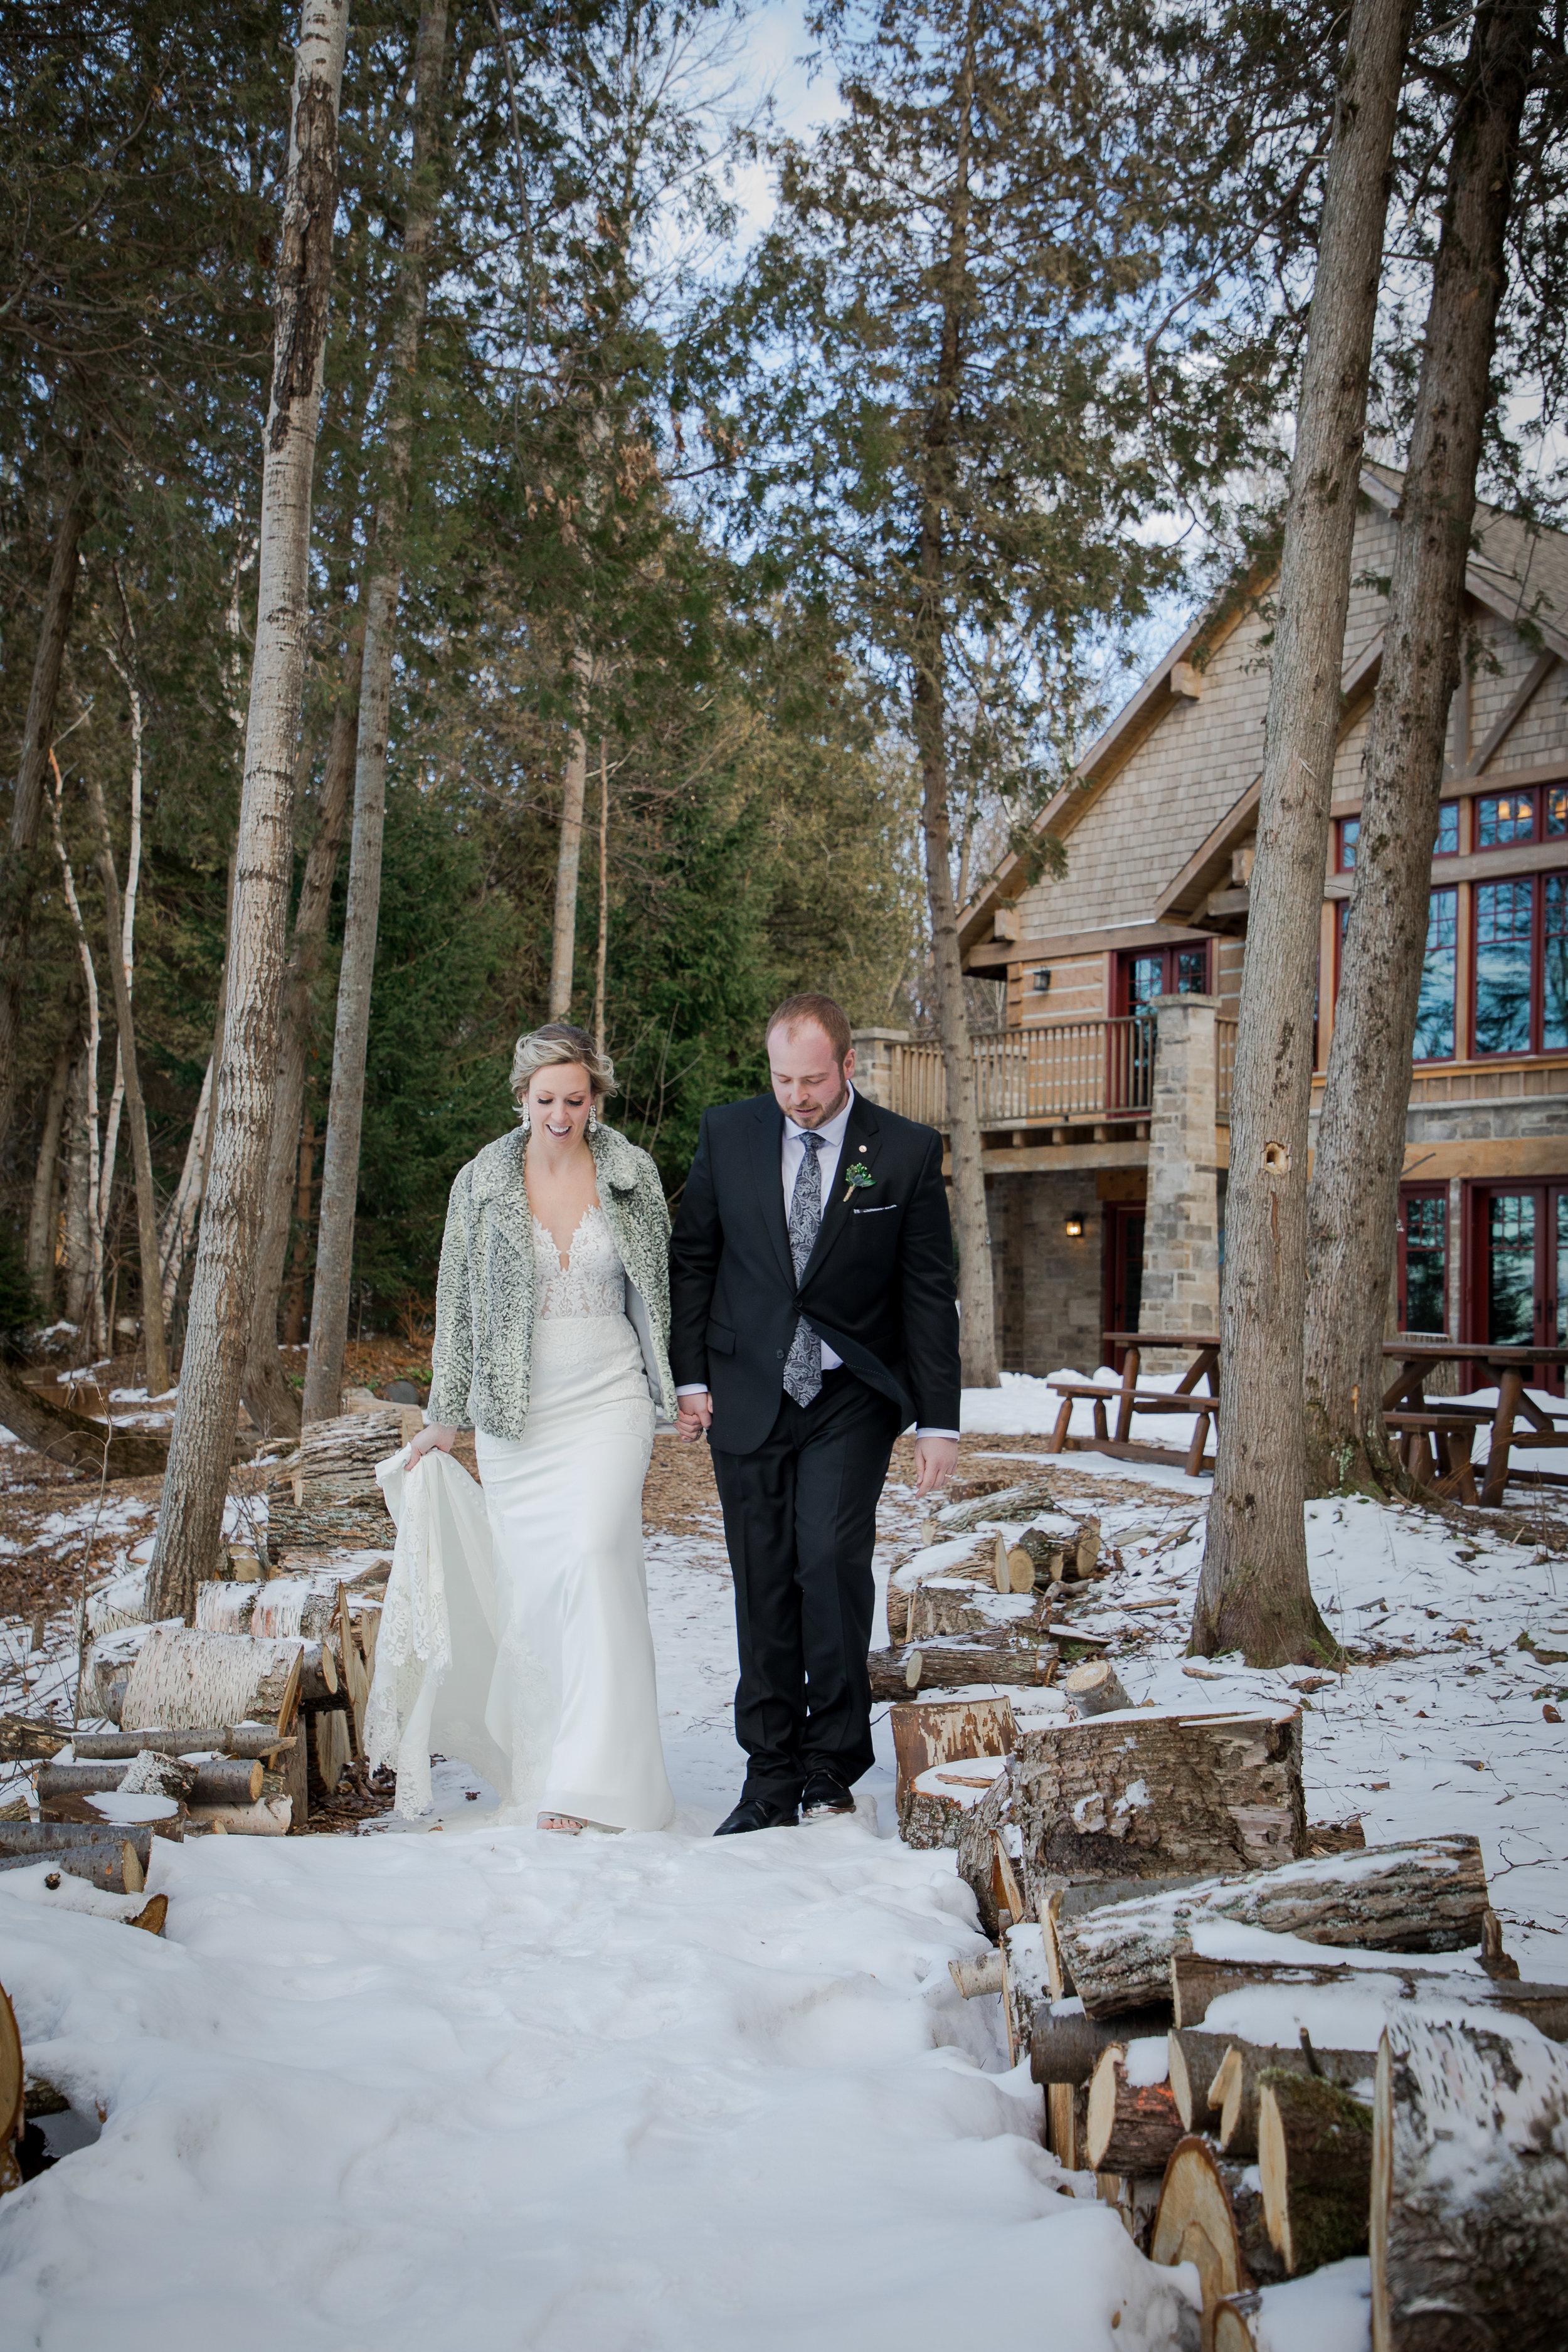 The-Griffiths-Wedding-10-03-10-161.jpg